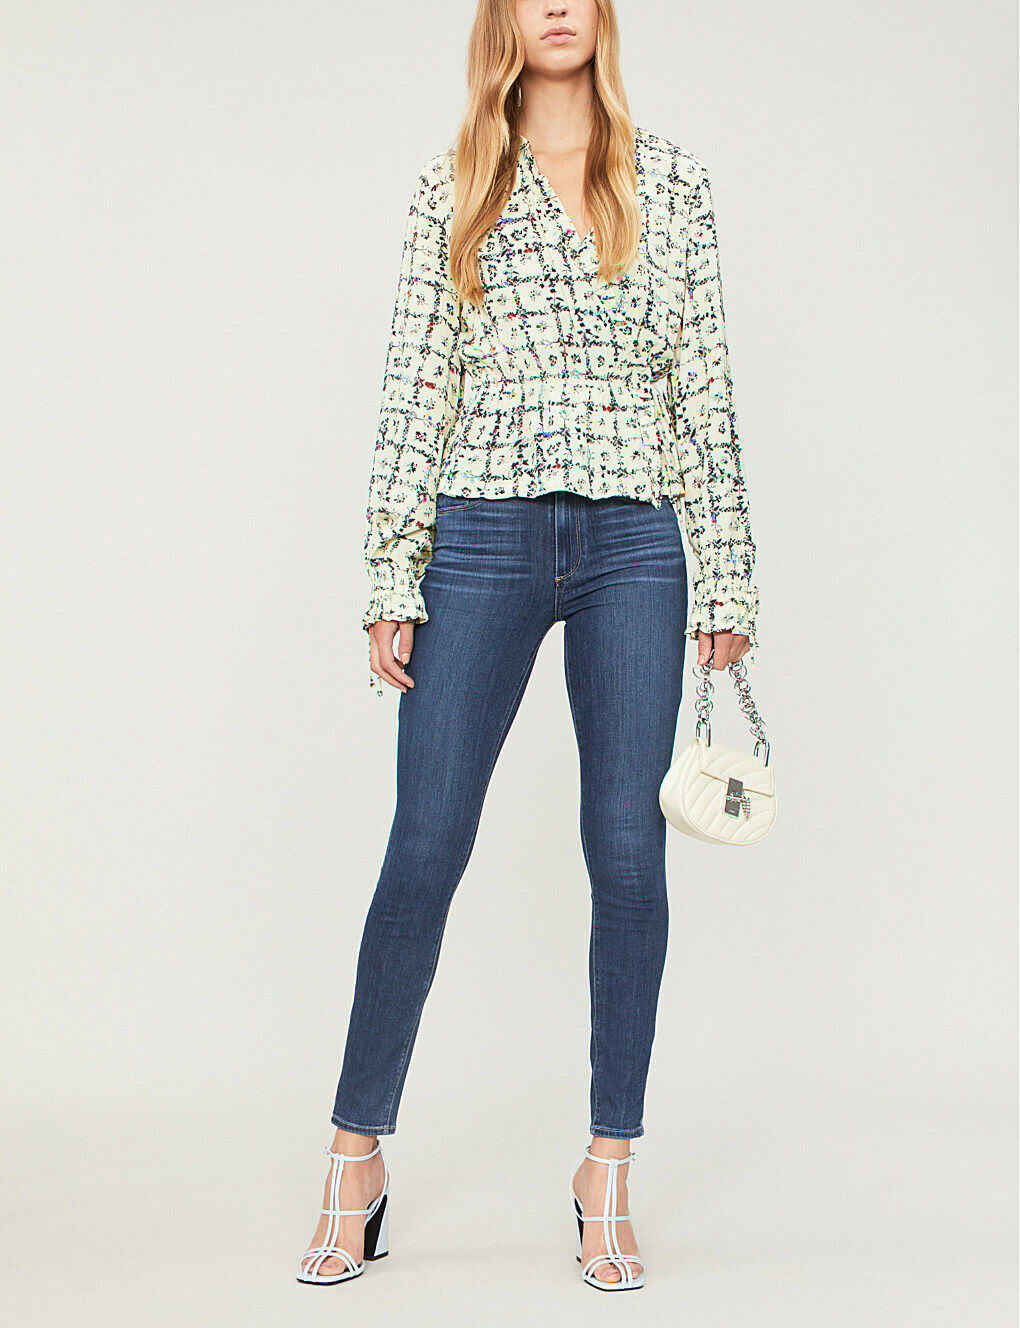 Paige Hoxton Skinny High-Rise Jeans-MONTARA-W26, W27 -